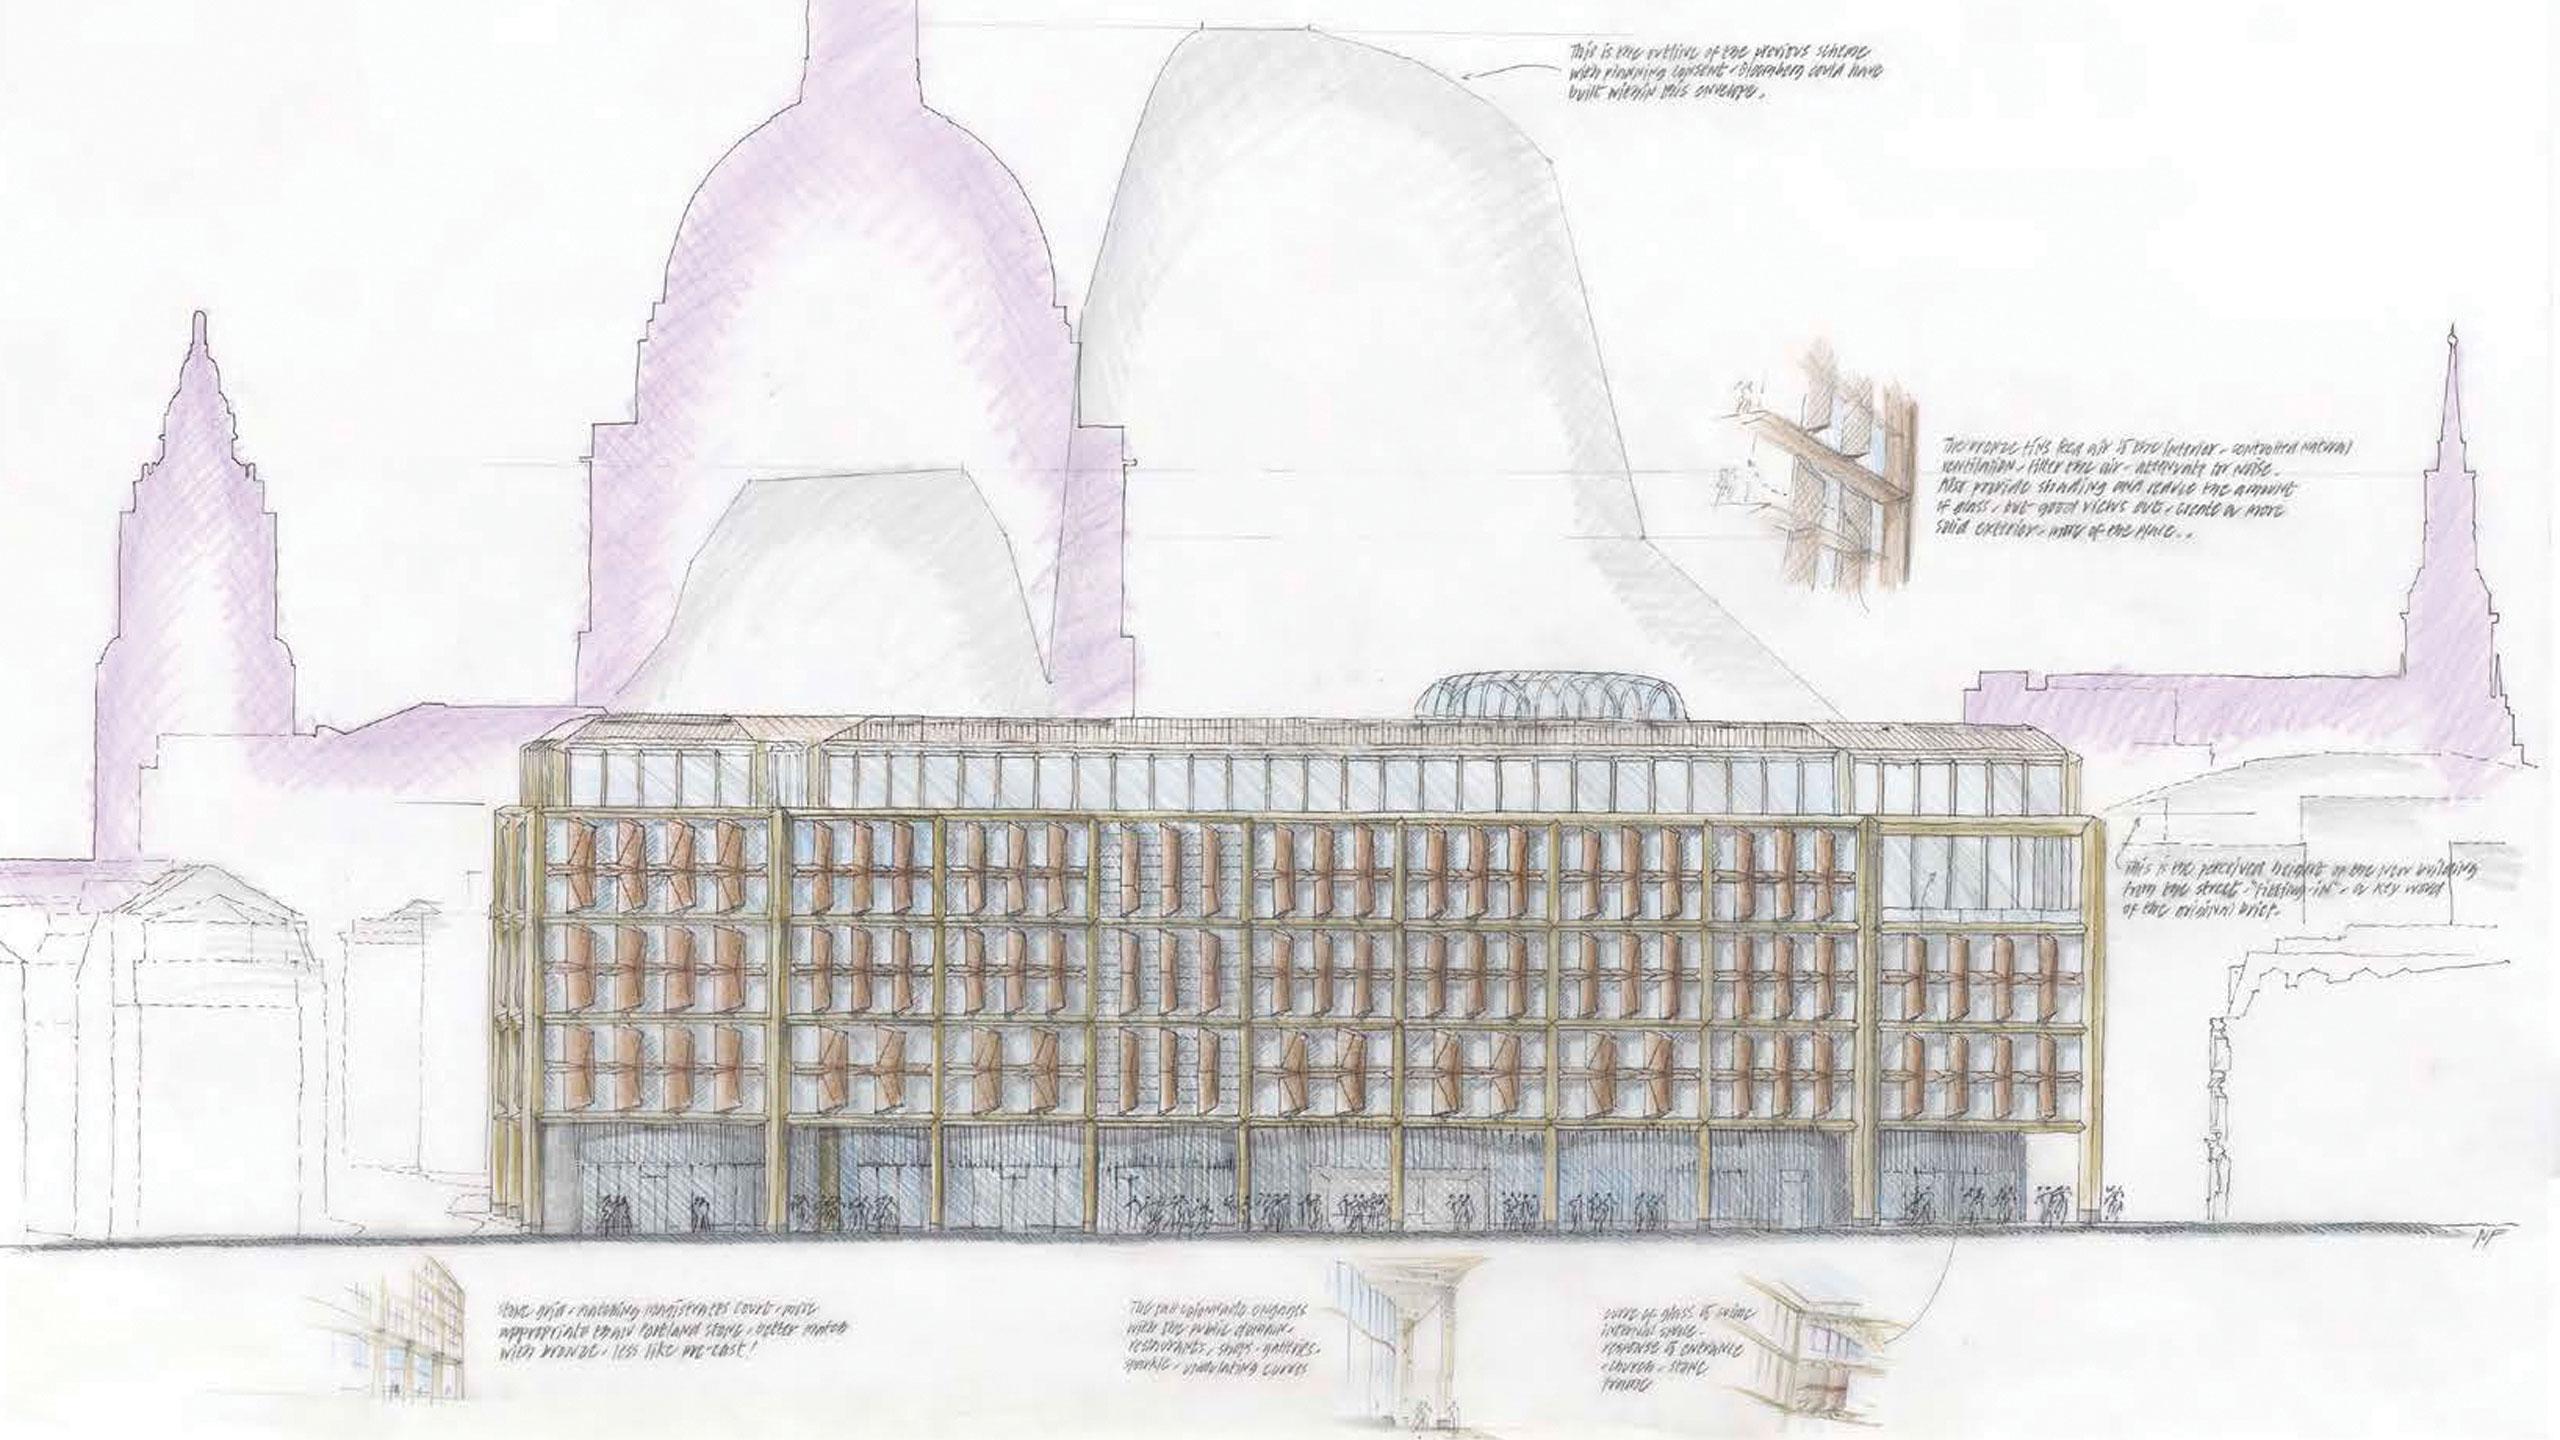 Bloomberg EU HQ_red oak carousel_image 2_0